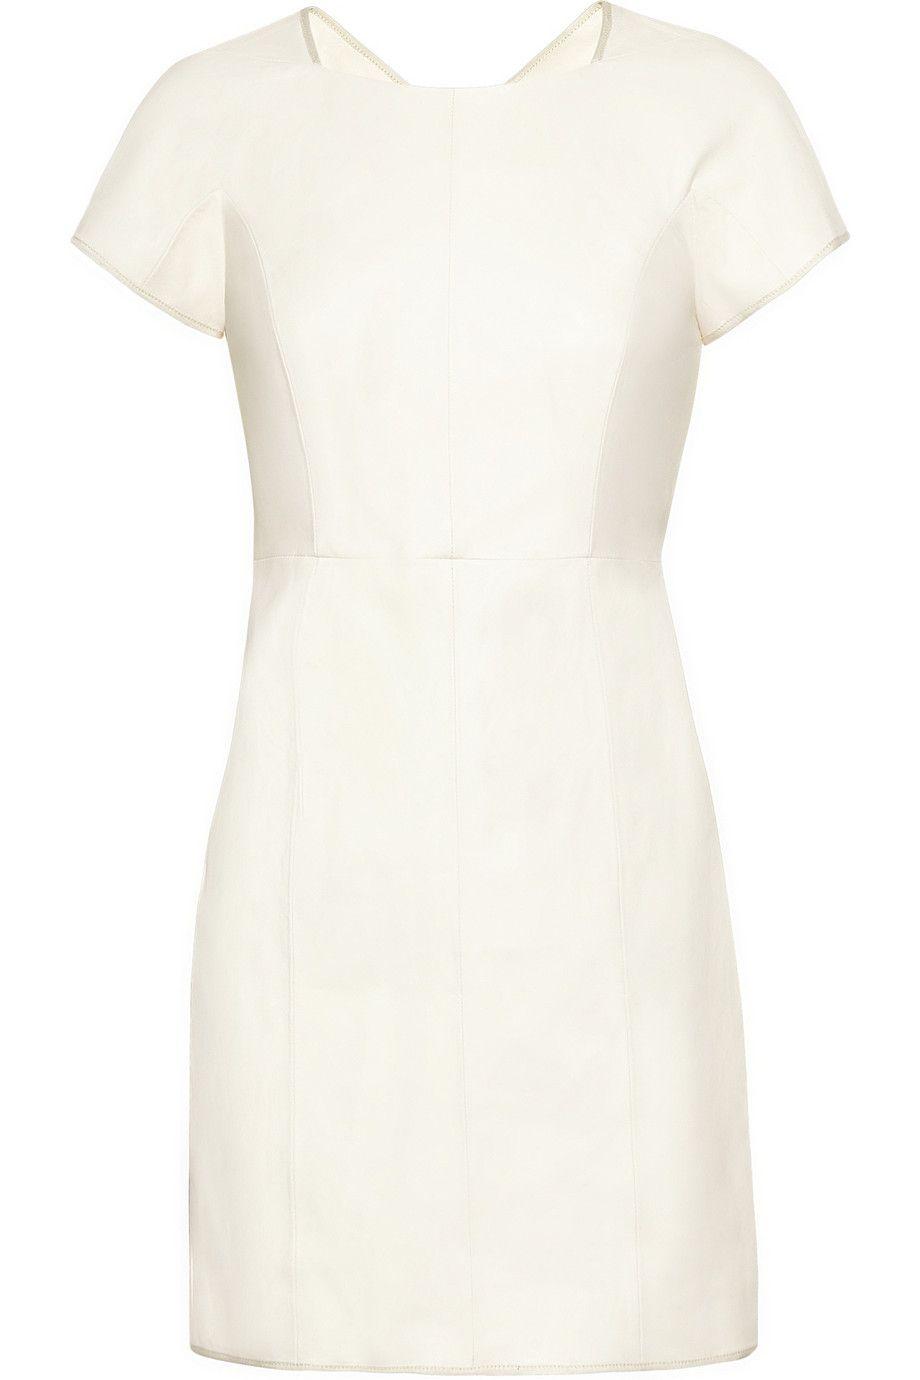 Theyskens Theory White Leather Dress Leather Mini Dress Little White Dresses [ 1380 x 920 Pixel ]